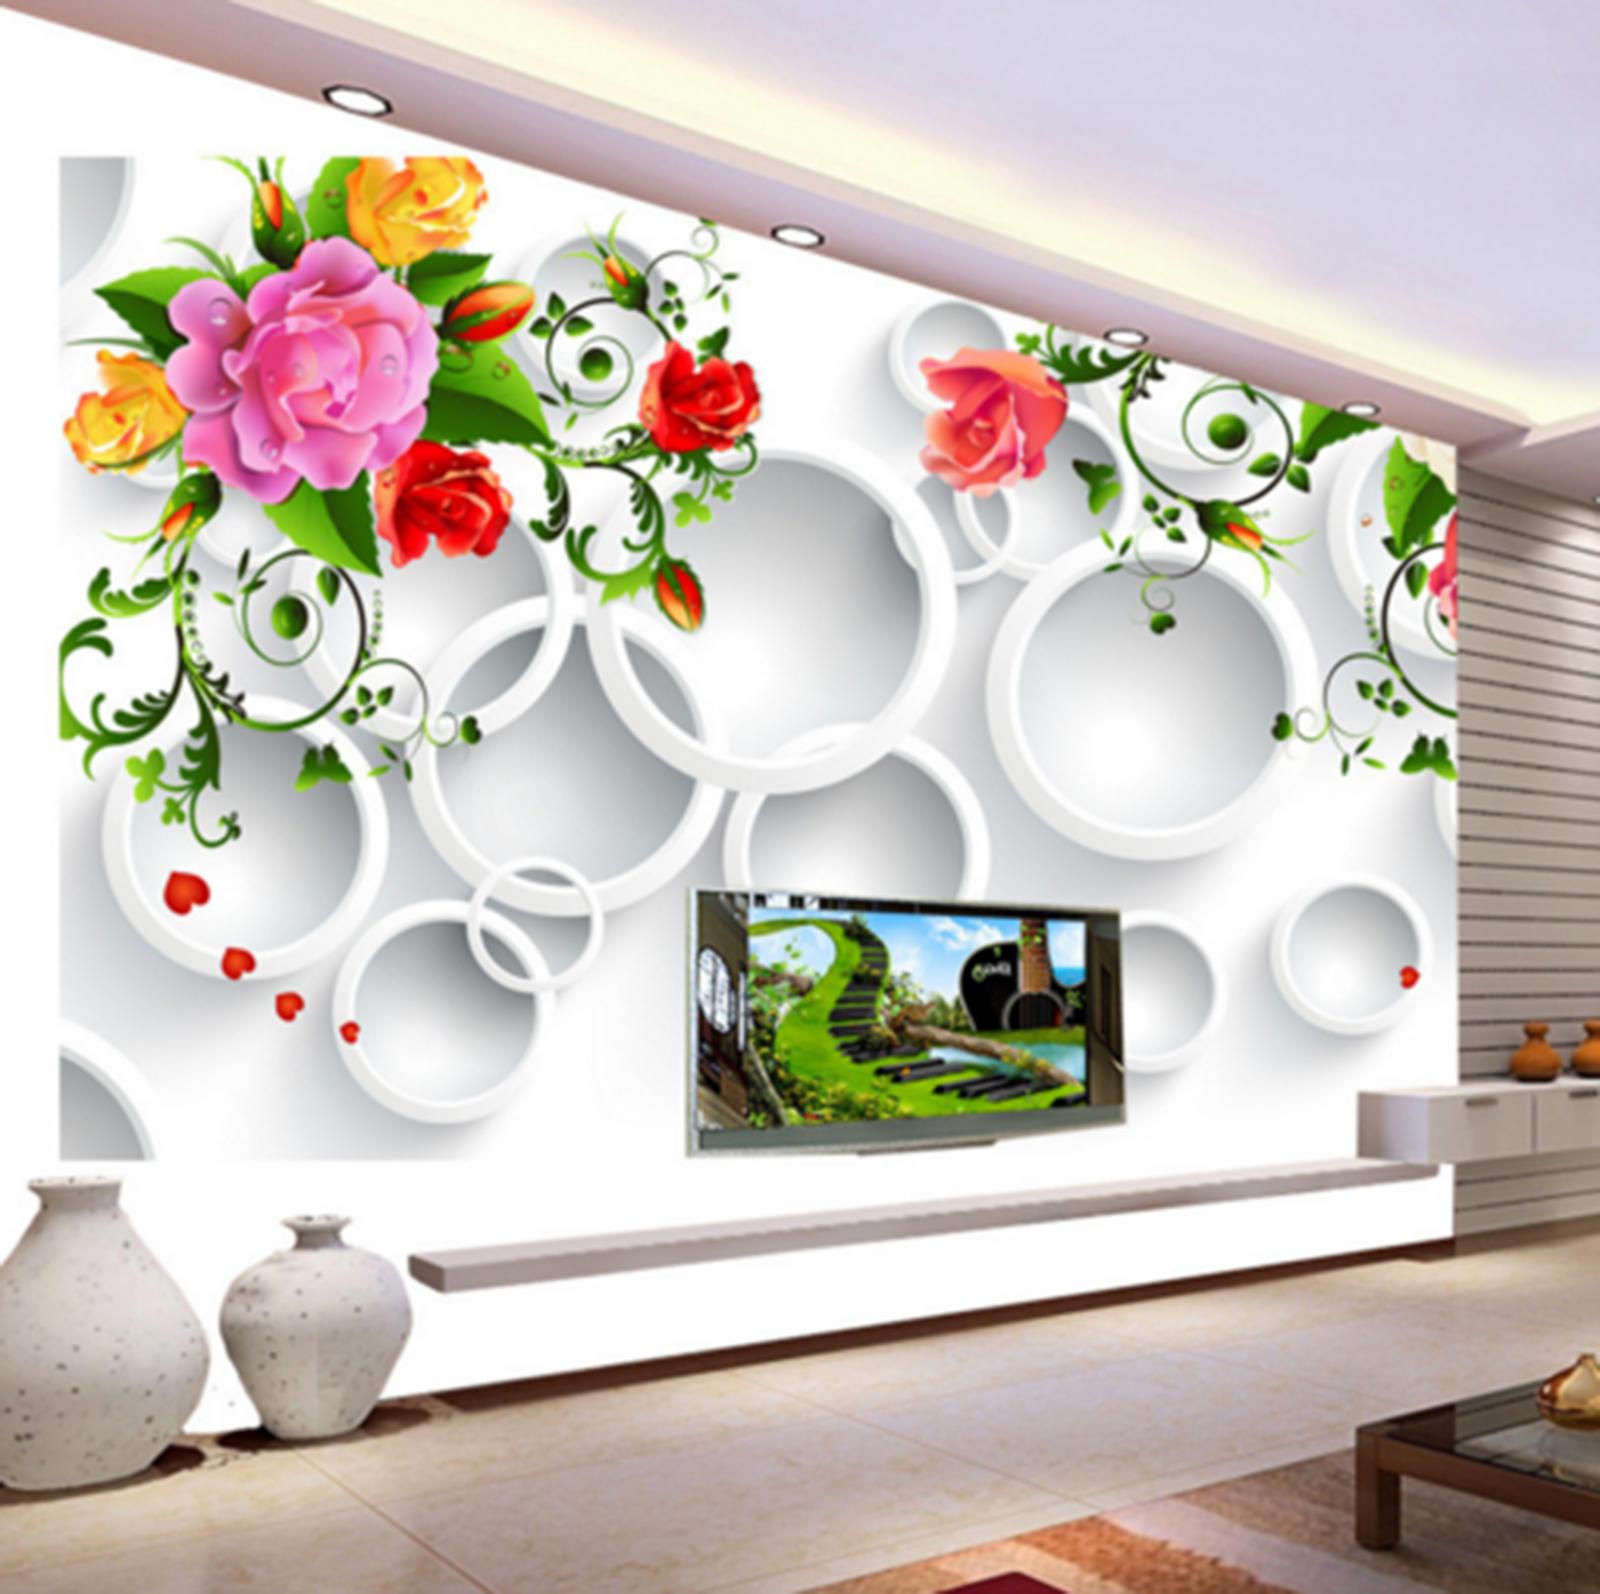 3D MulticolGoldt 54 Wallpaper Murals Wall Print Wallpaper Mural AJ WALL UK Kyra